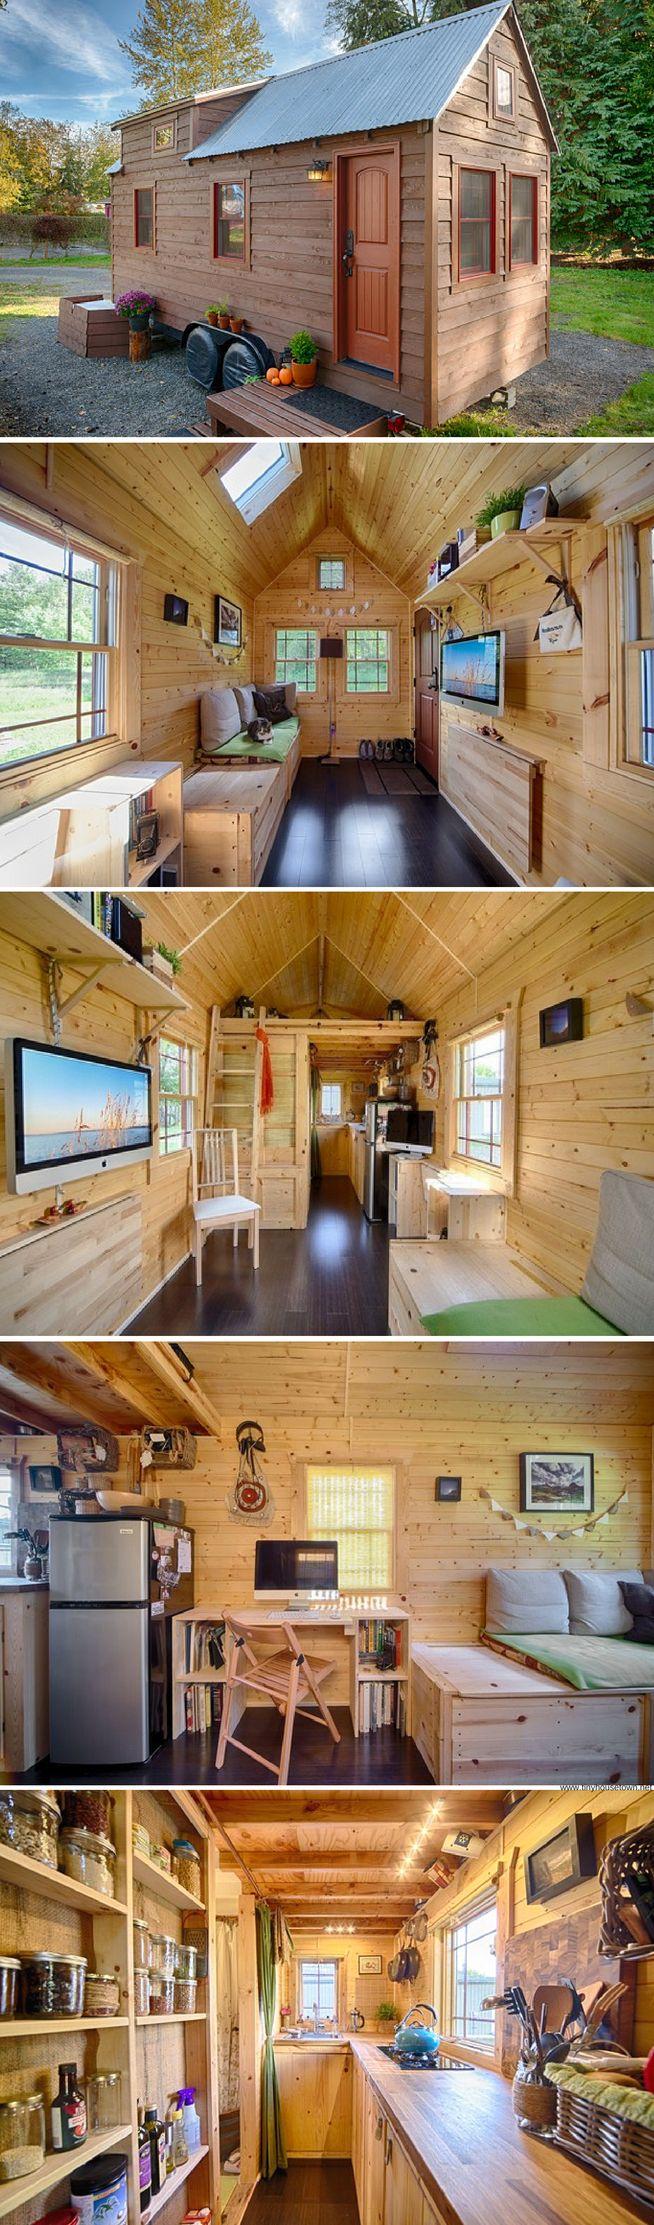 Bachelor 484 sq ft log home kit log cabin kit mountain ridge - The Tach House A 140 Sq Ft Tiny House In Everett Wa